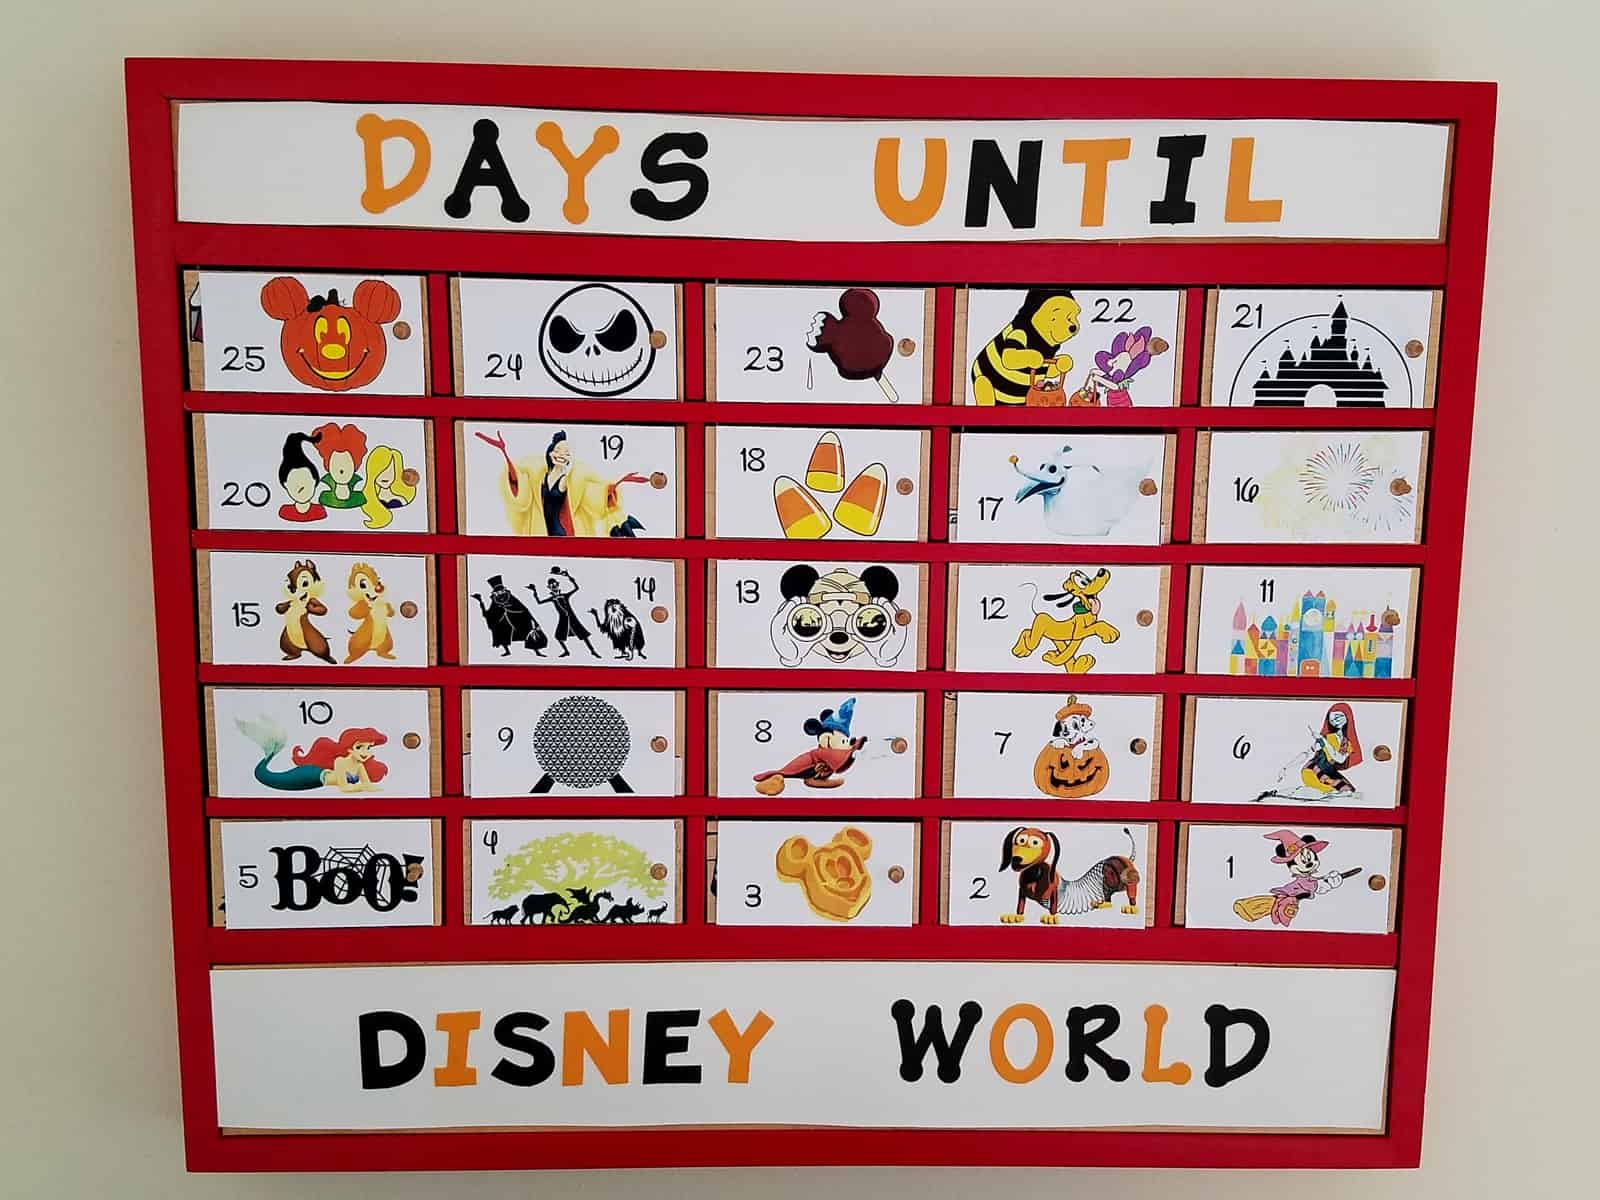 Disney world countdown